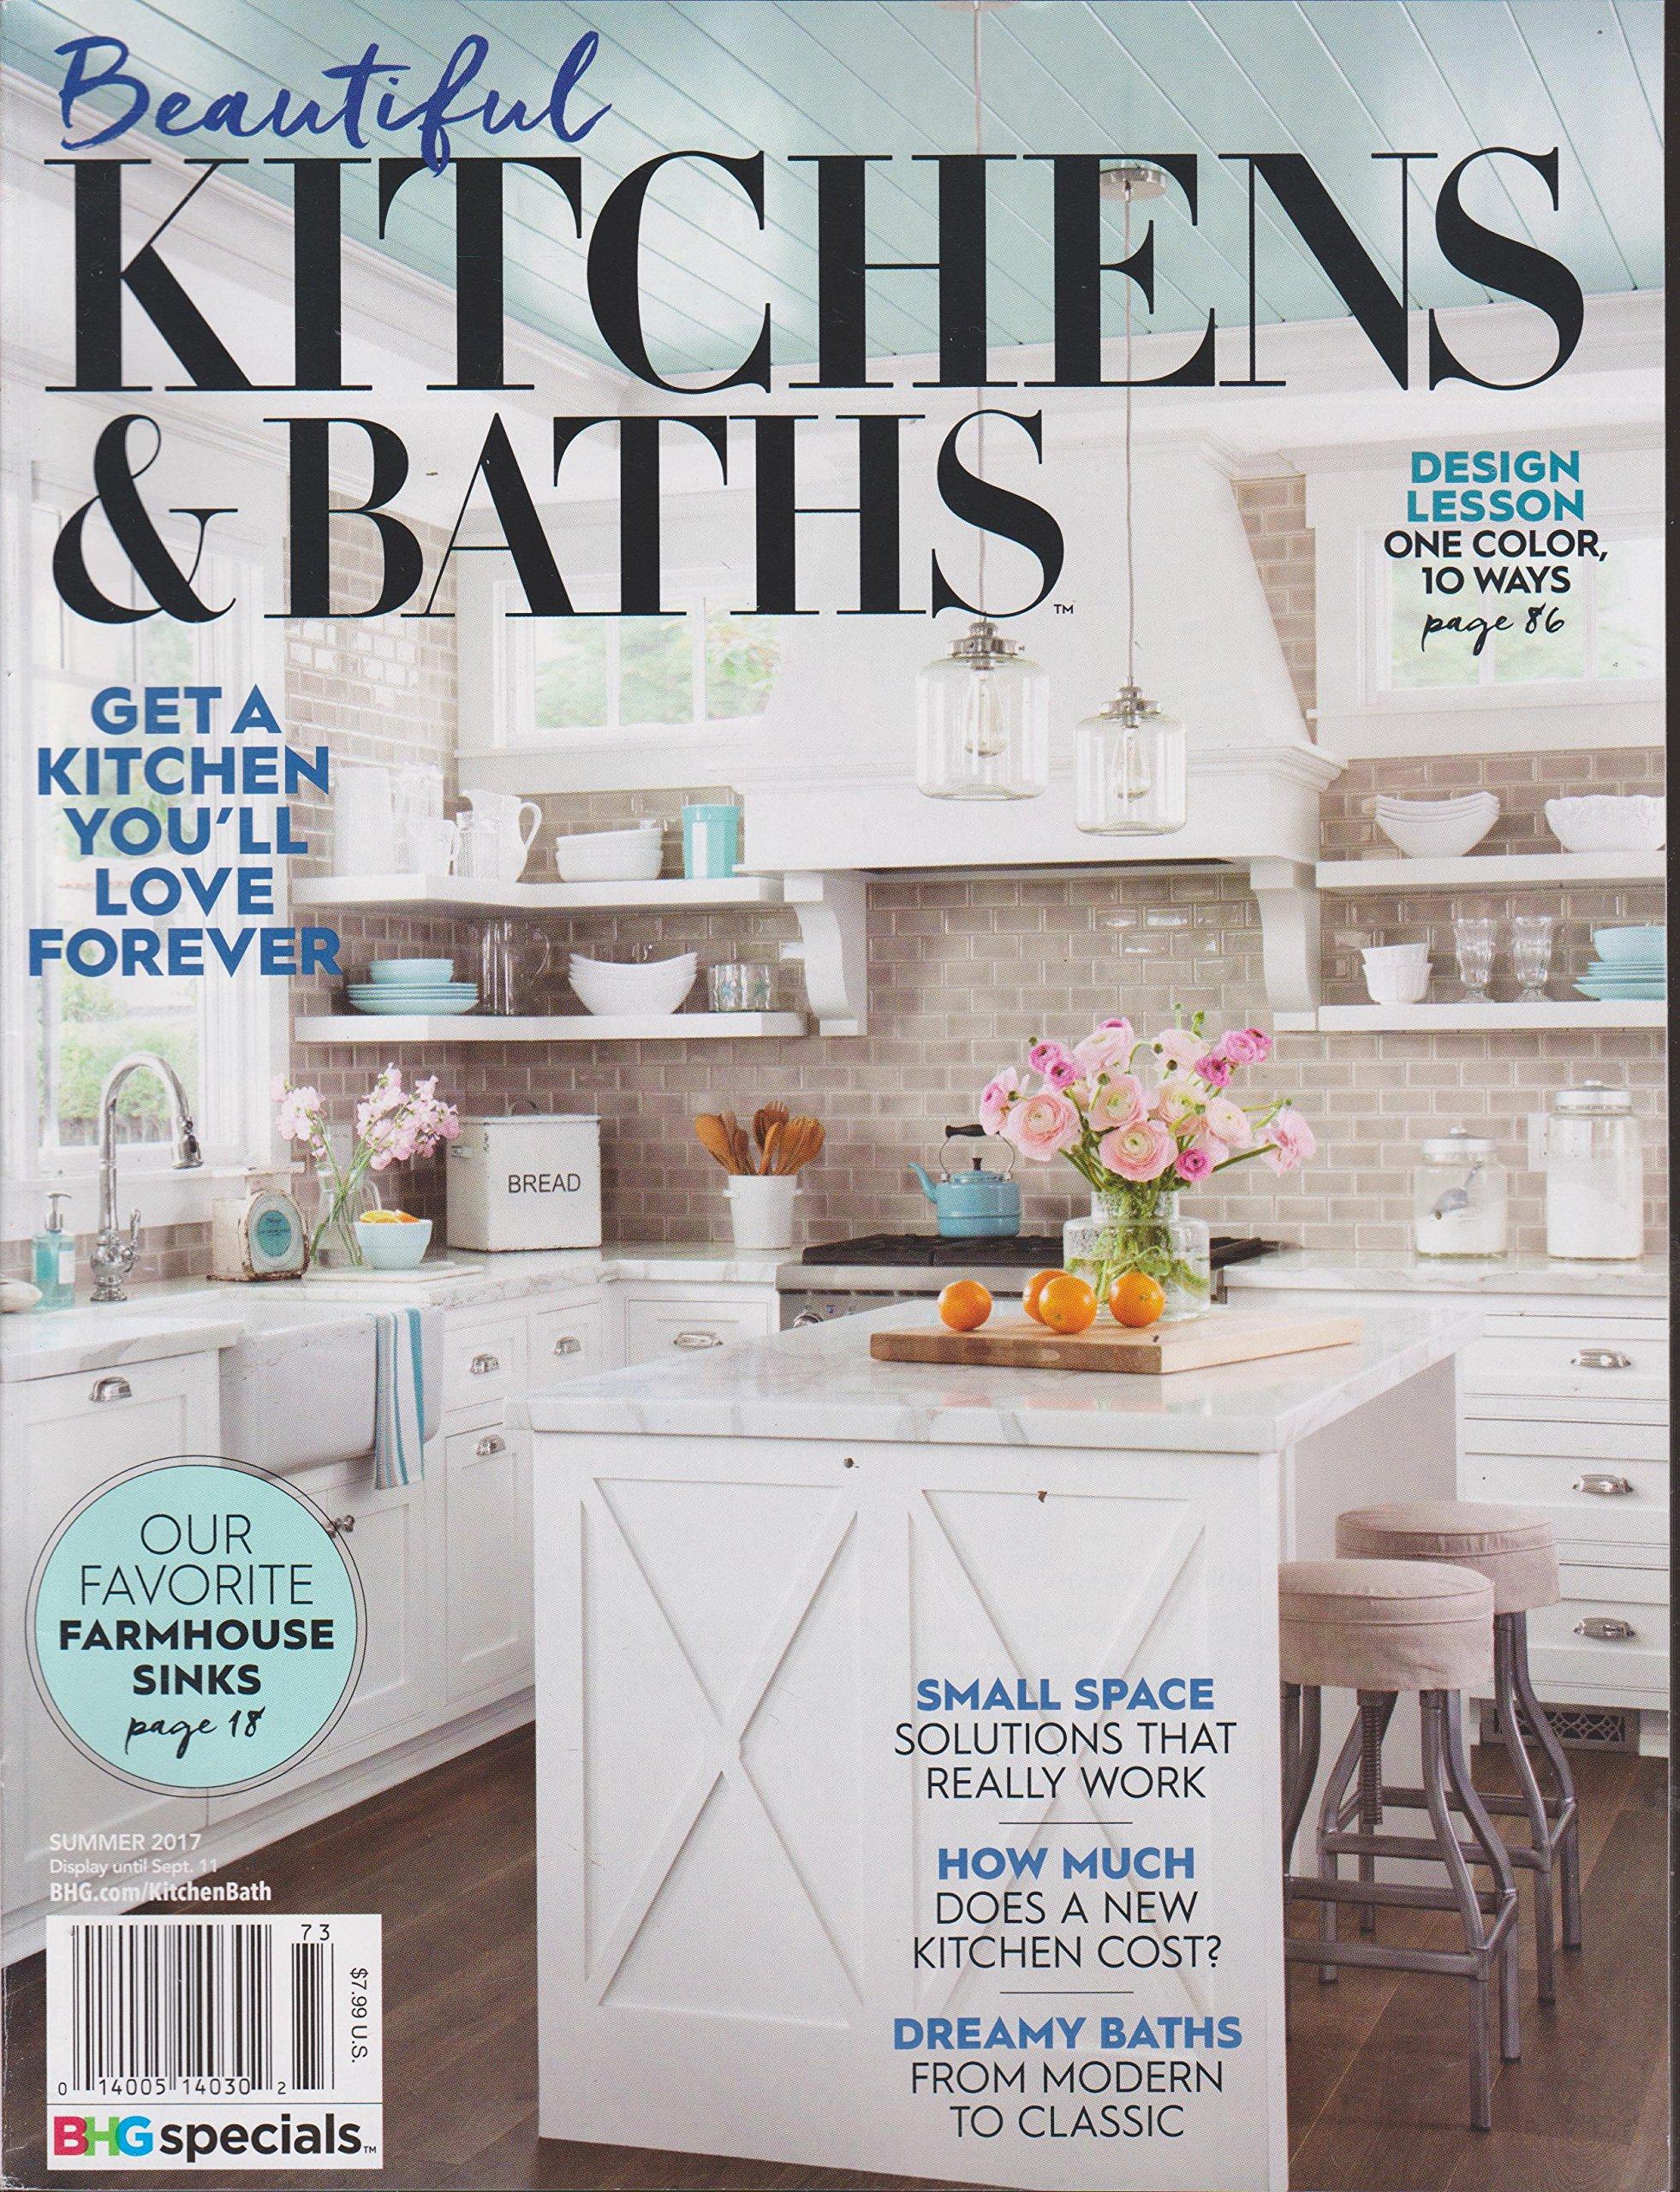 Beautiful Kitchens U0026 Baths Magazine Summer 2017: Various: Amazon.com: Books